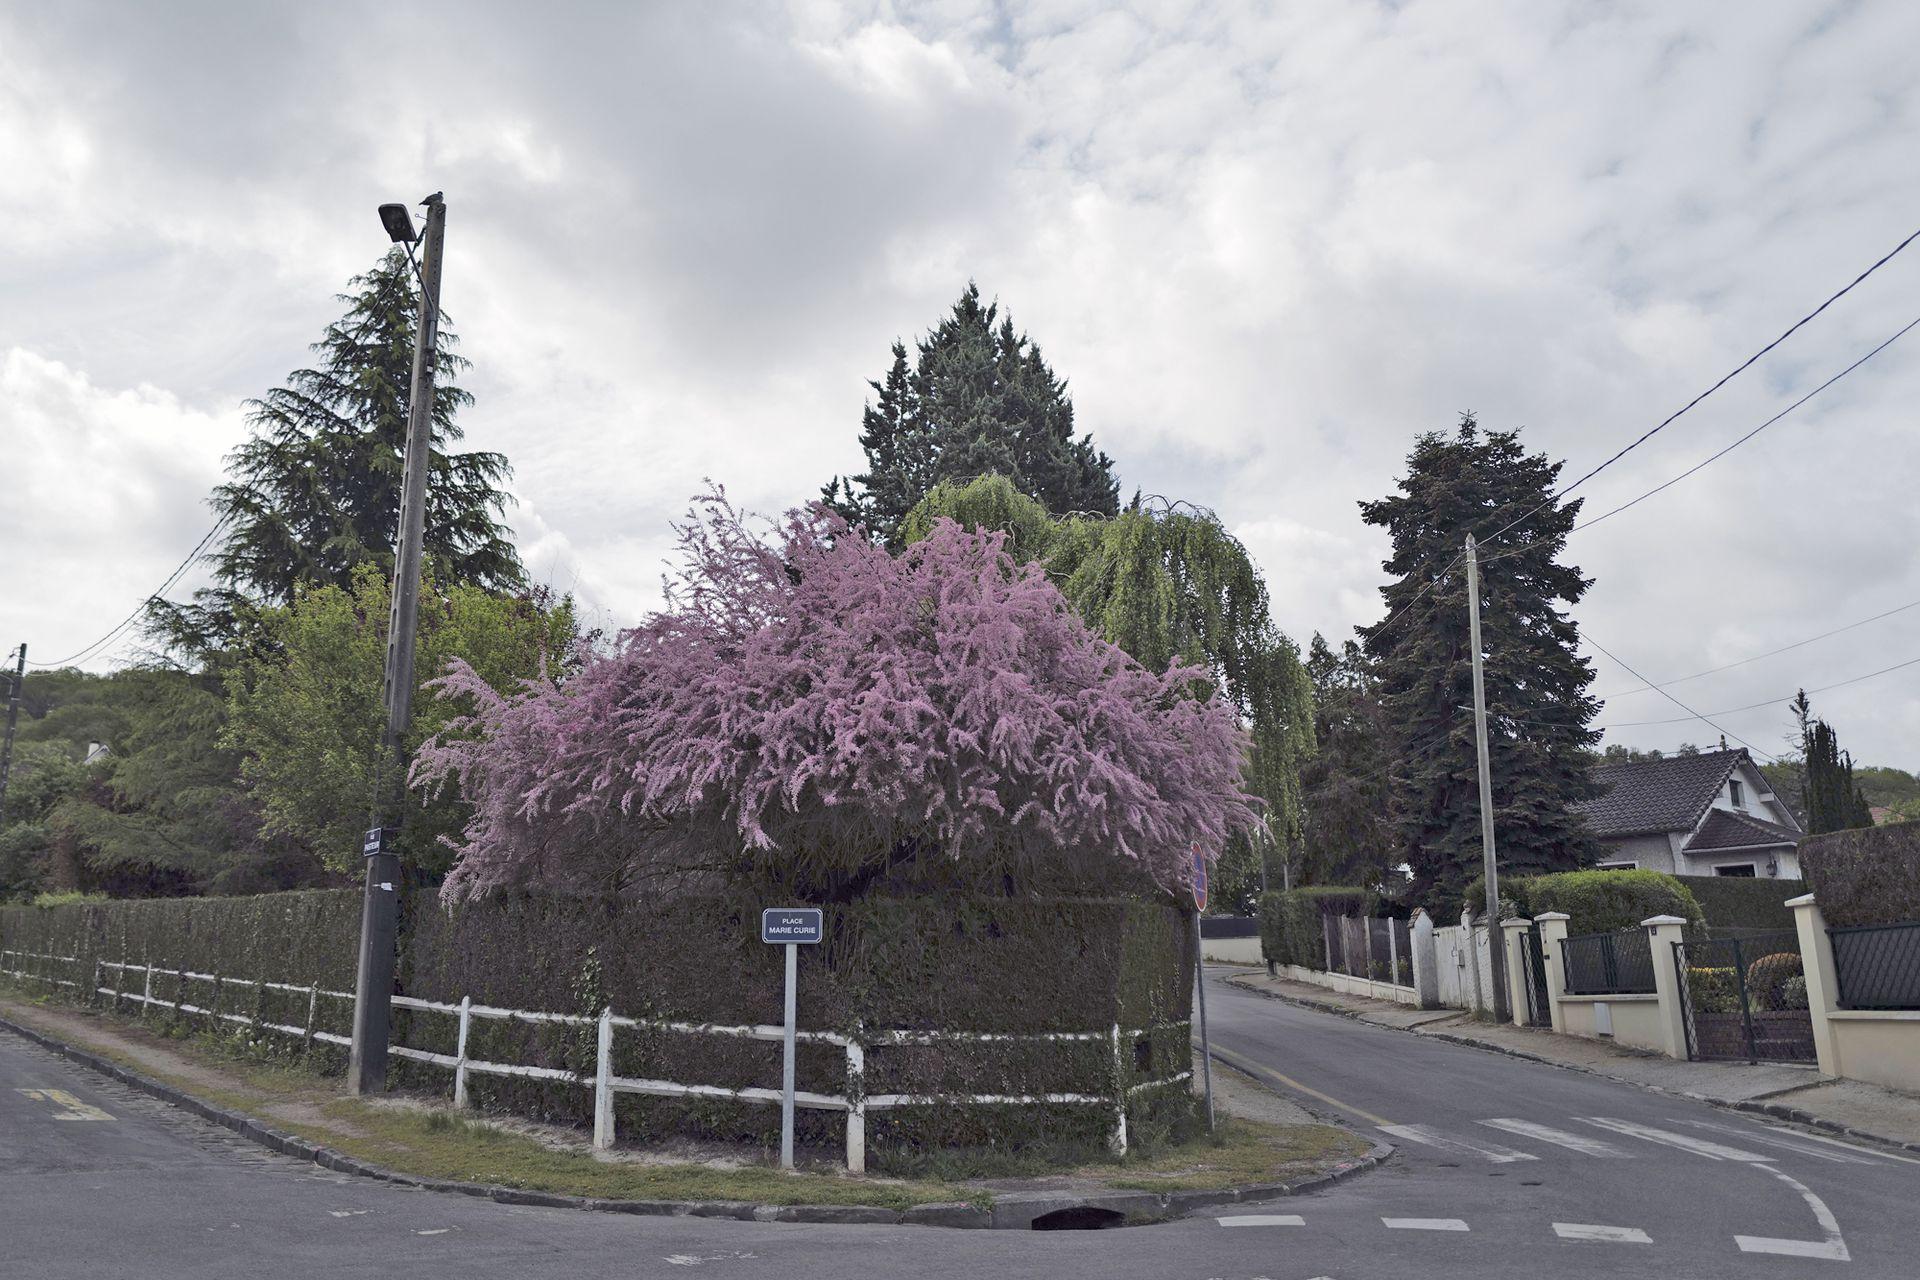 La casa está situada en el suburbio de Saint Remy les Chevreuse, en París.